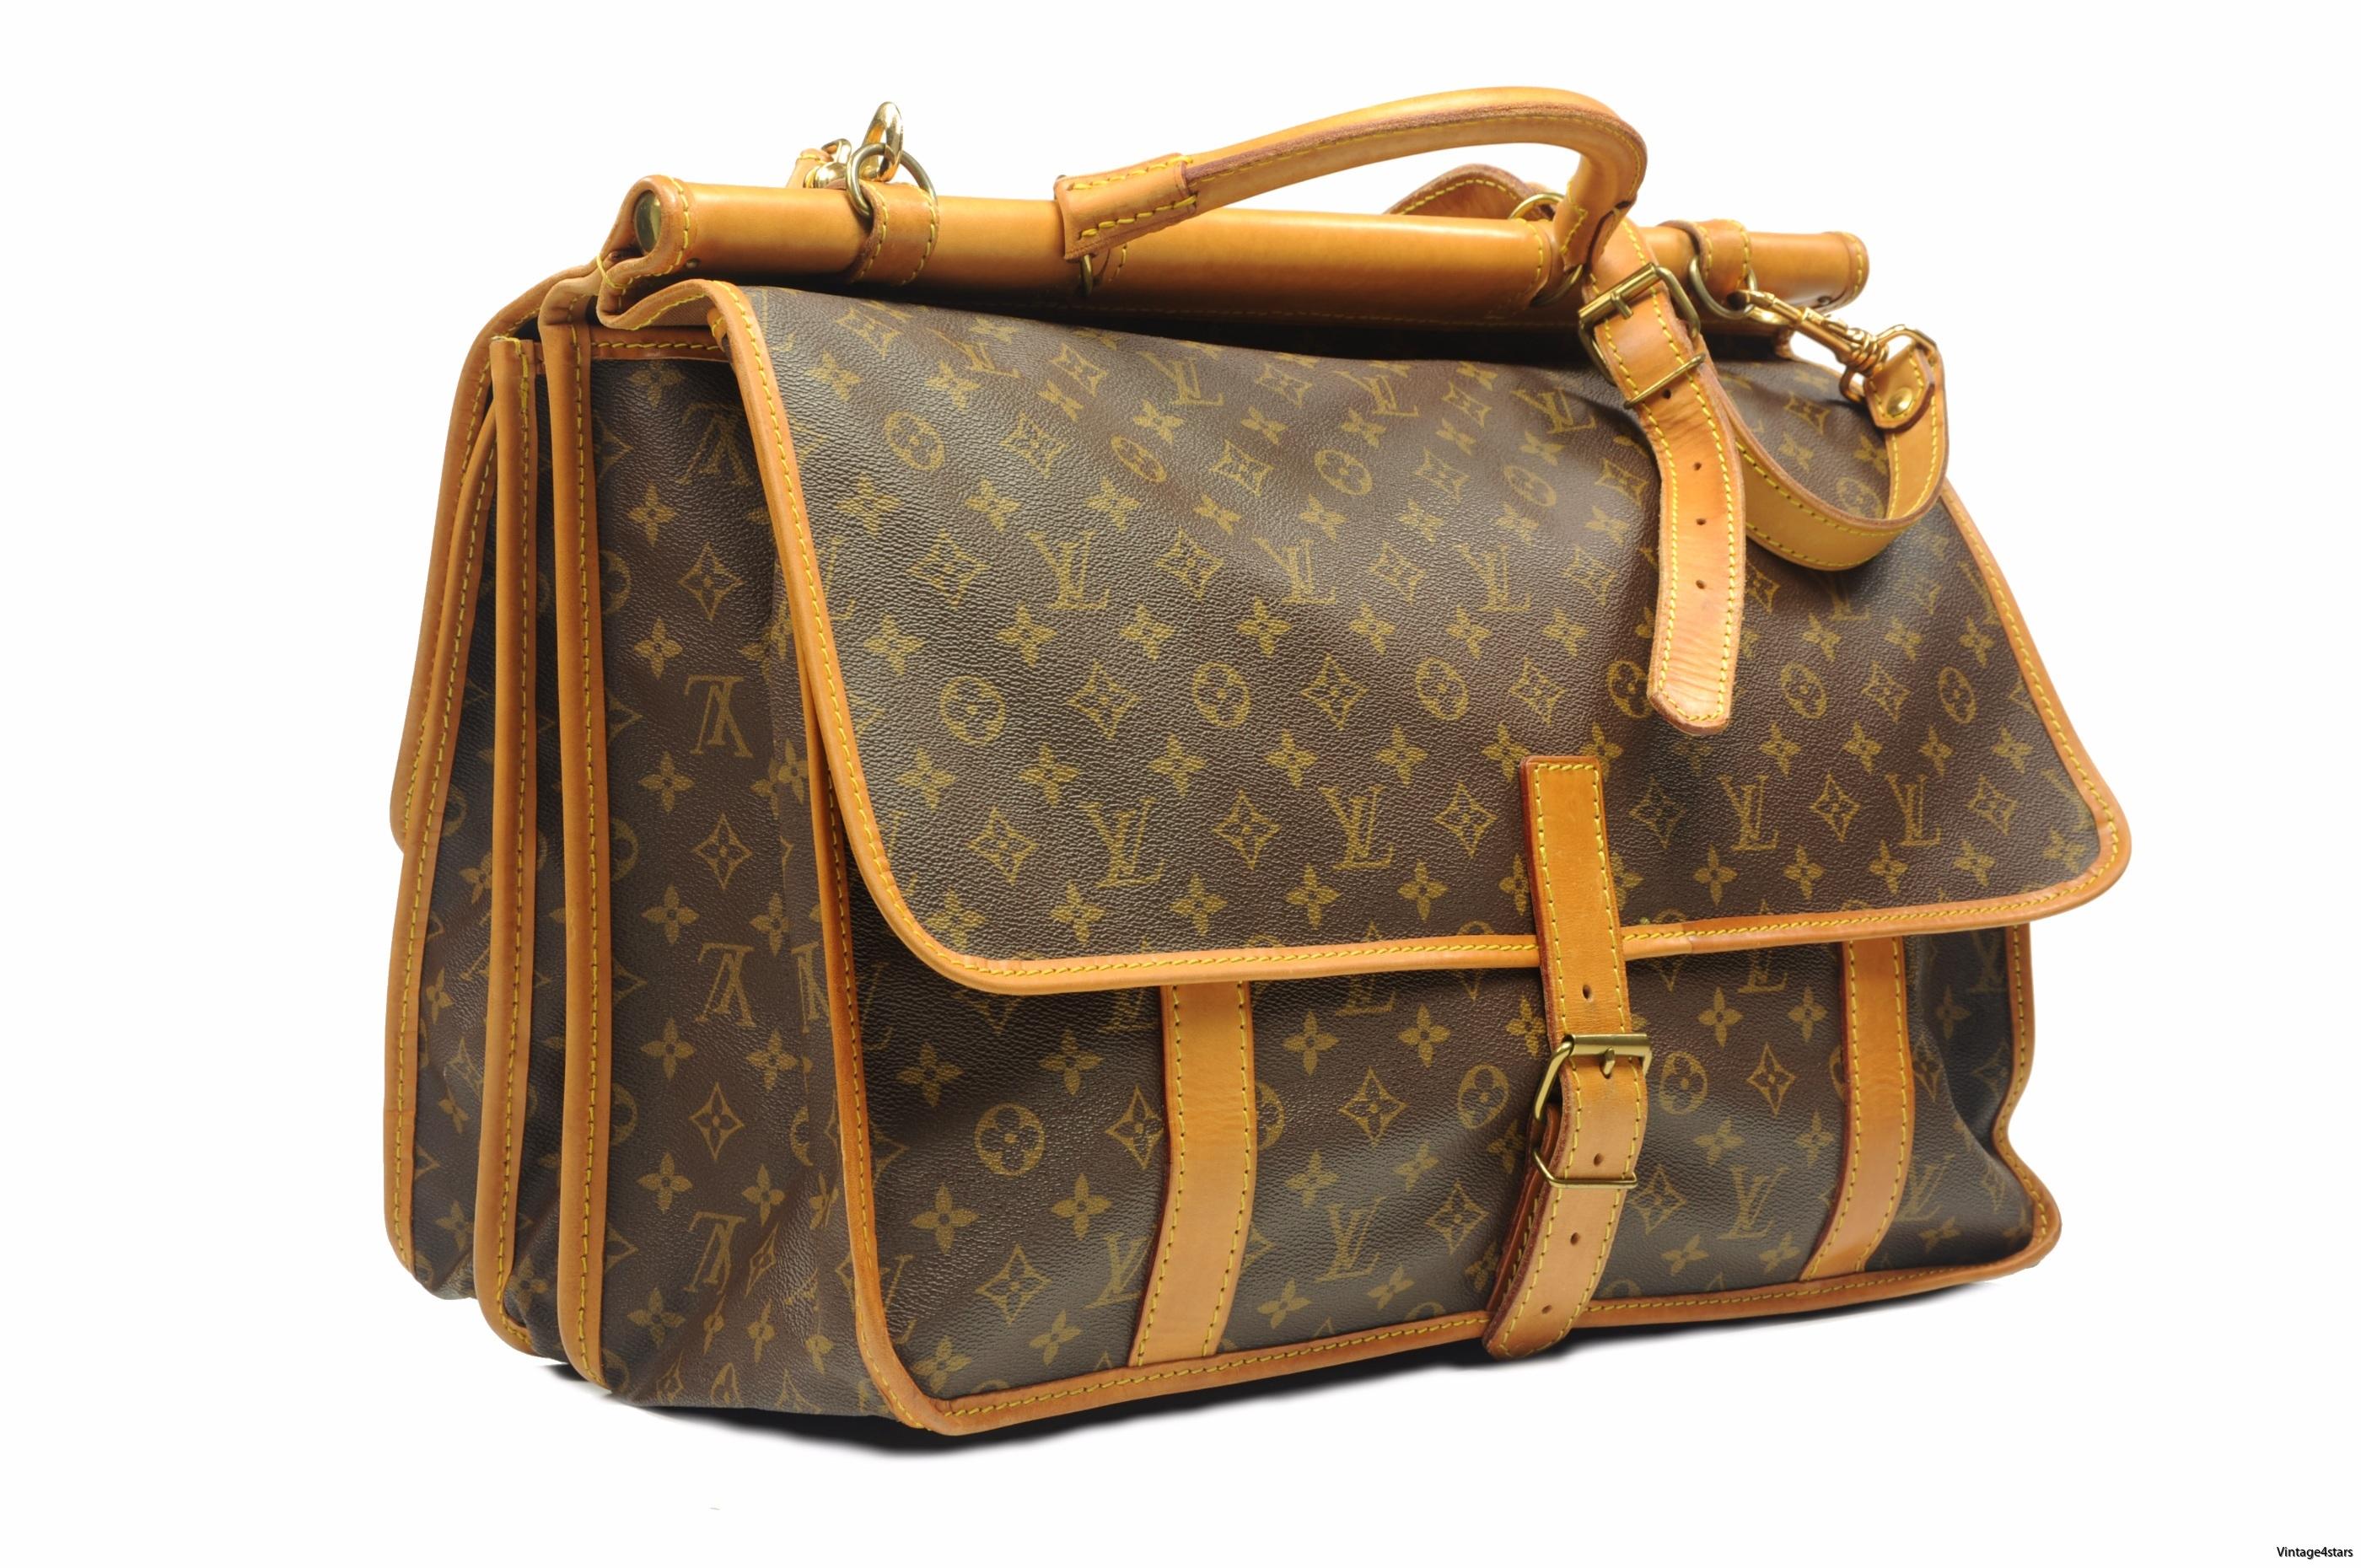 Louis Vuitton Sac Chasse Kleber 03